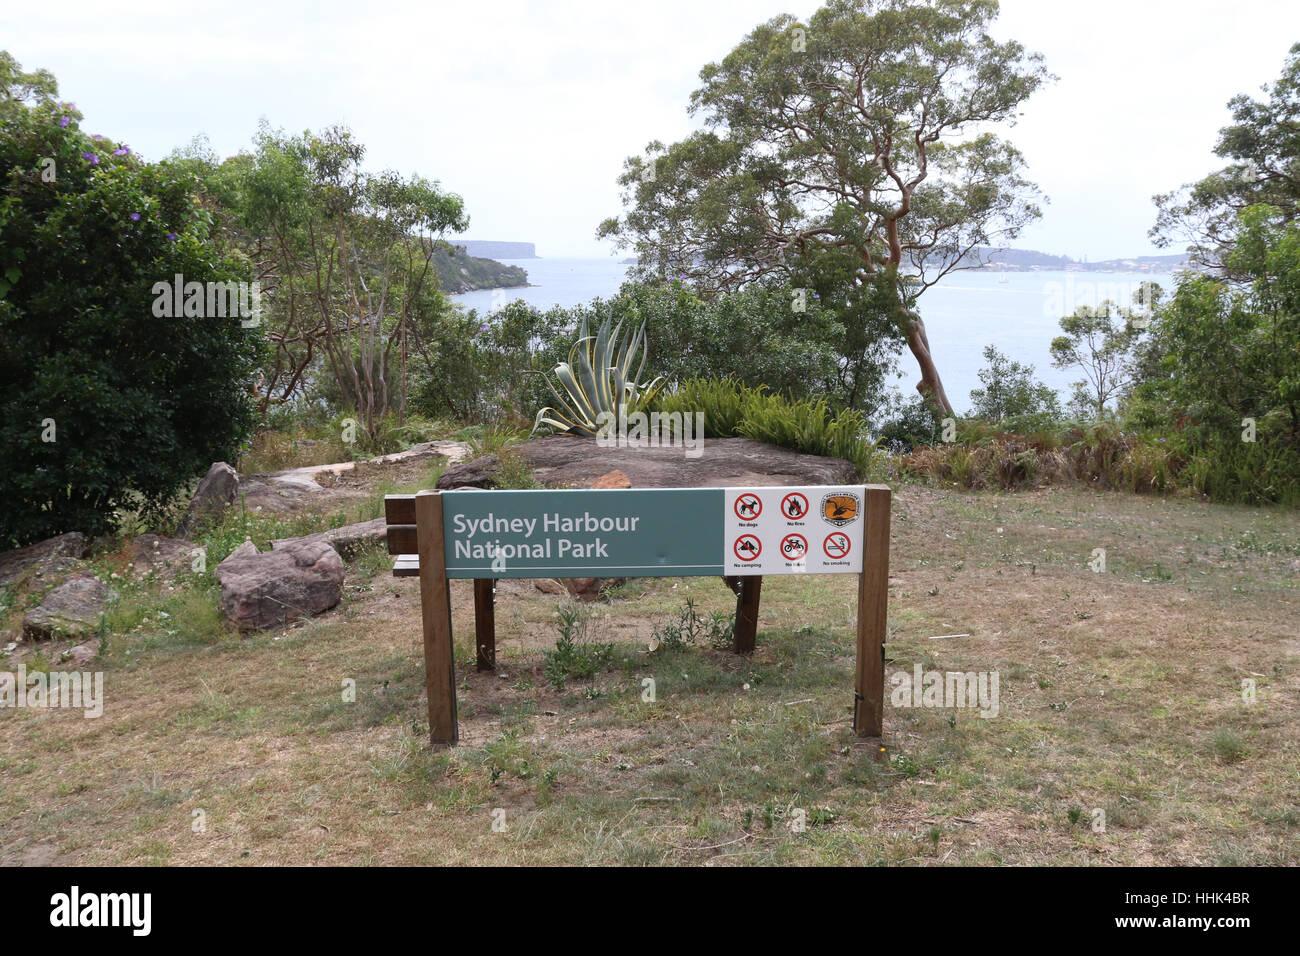 Sydney Harbour National Park, Mosman on Sydney's Lower North Shore. - Stock Image